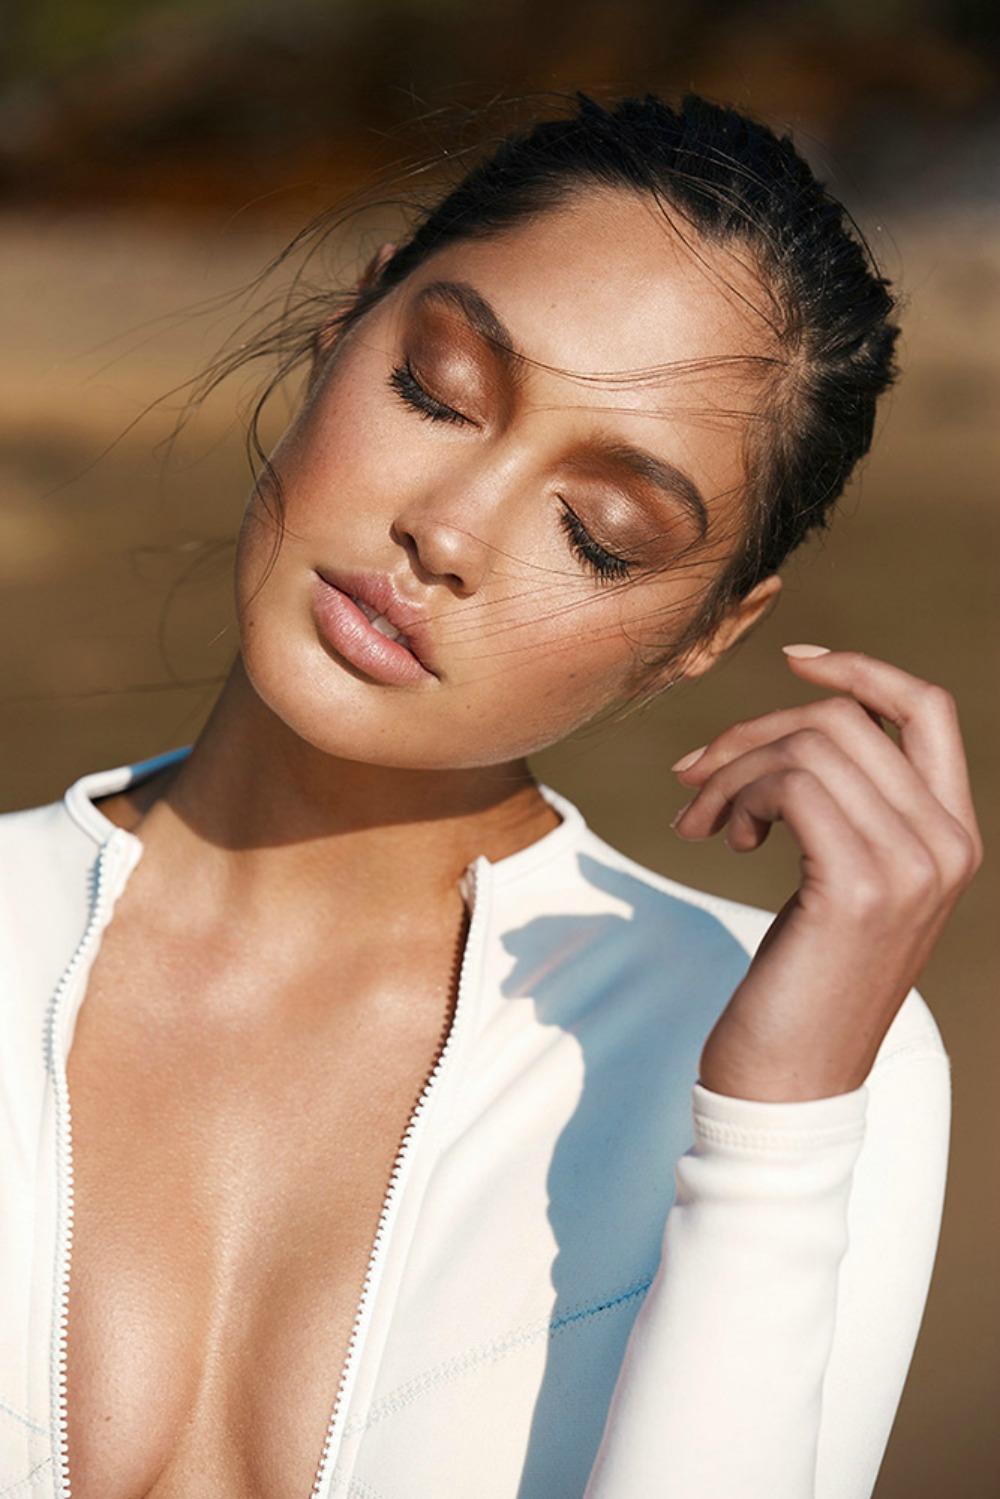 Soft & Beautiful Makeup Look @ acheekylifestyle.com by Val Banderman